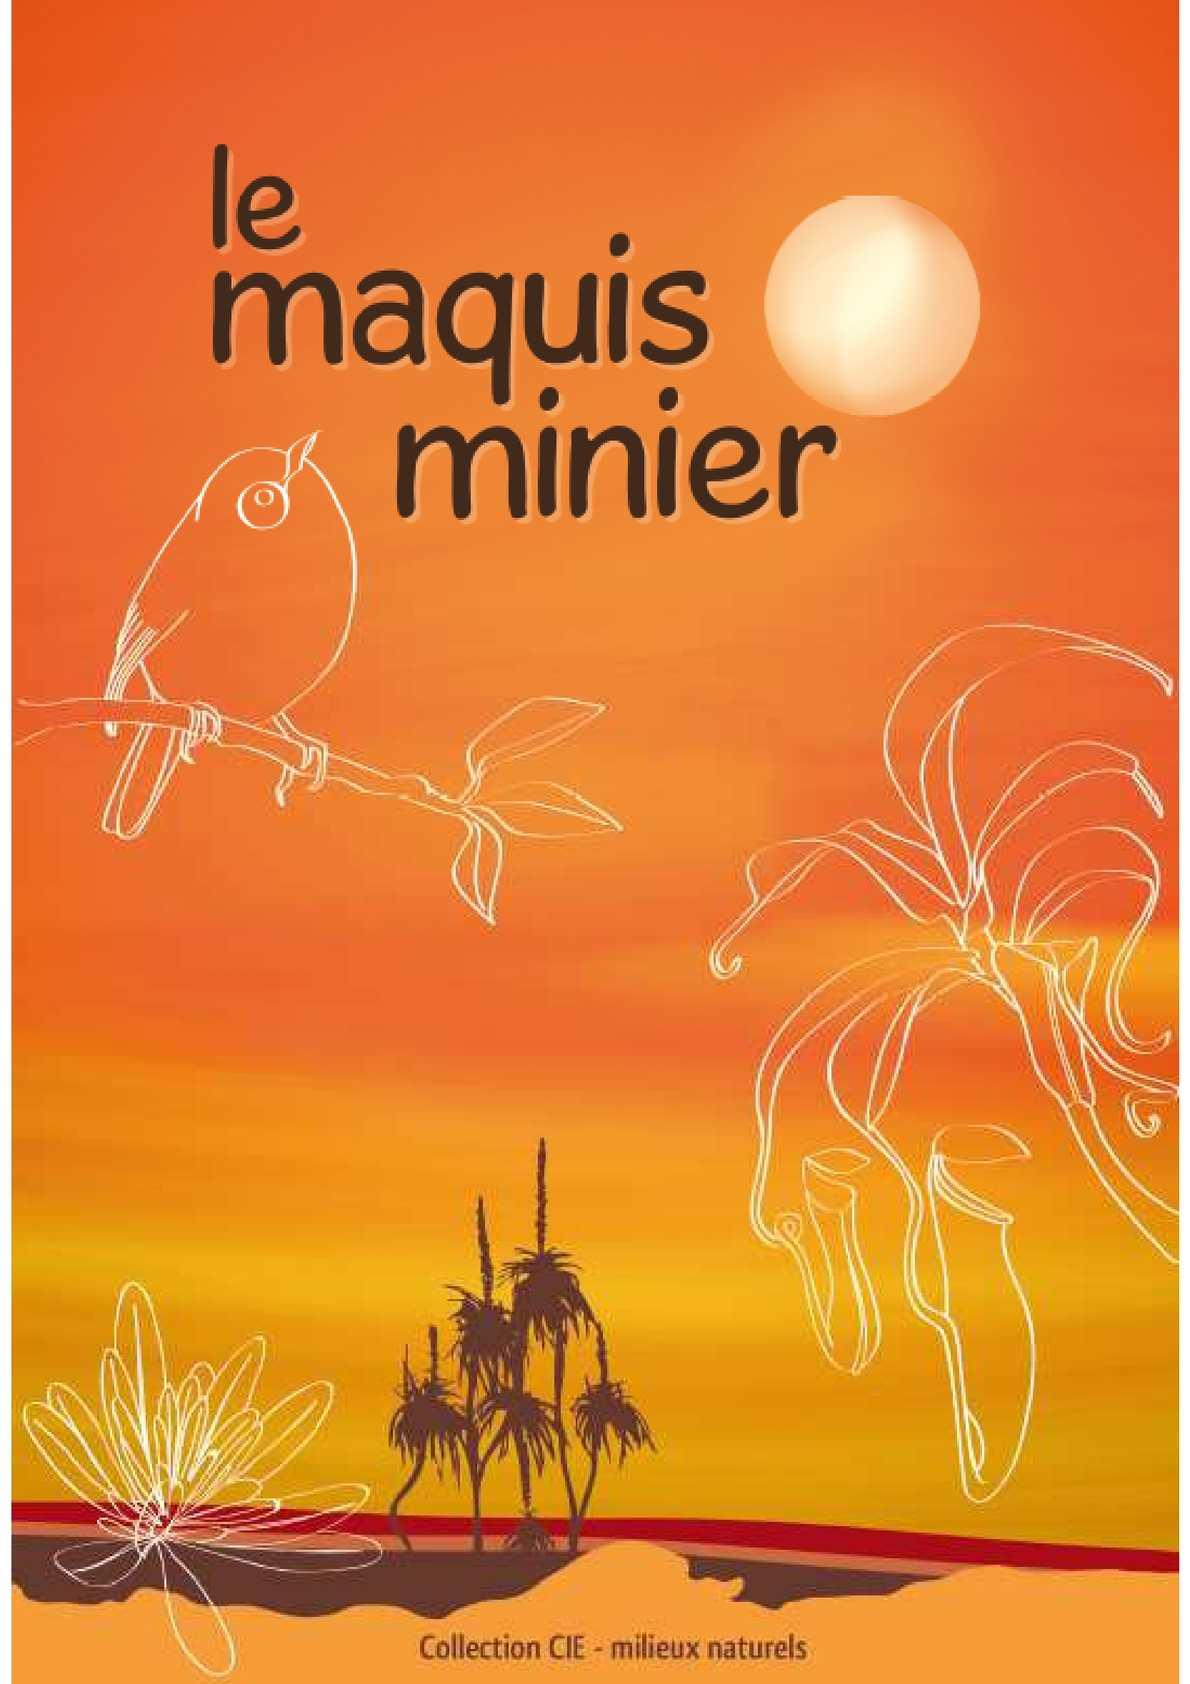 Le Maquis minier - Collection CIE